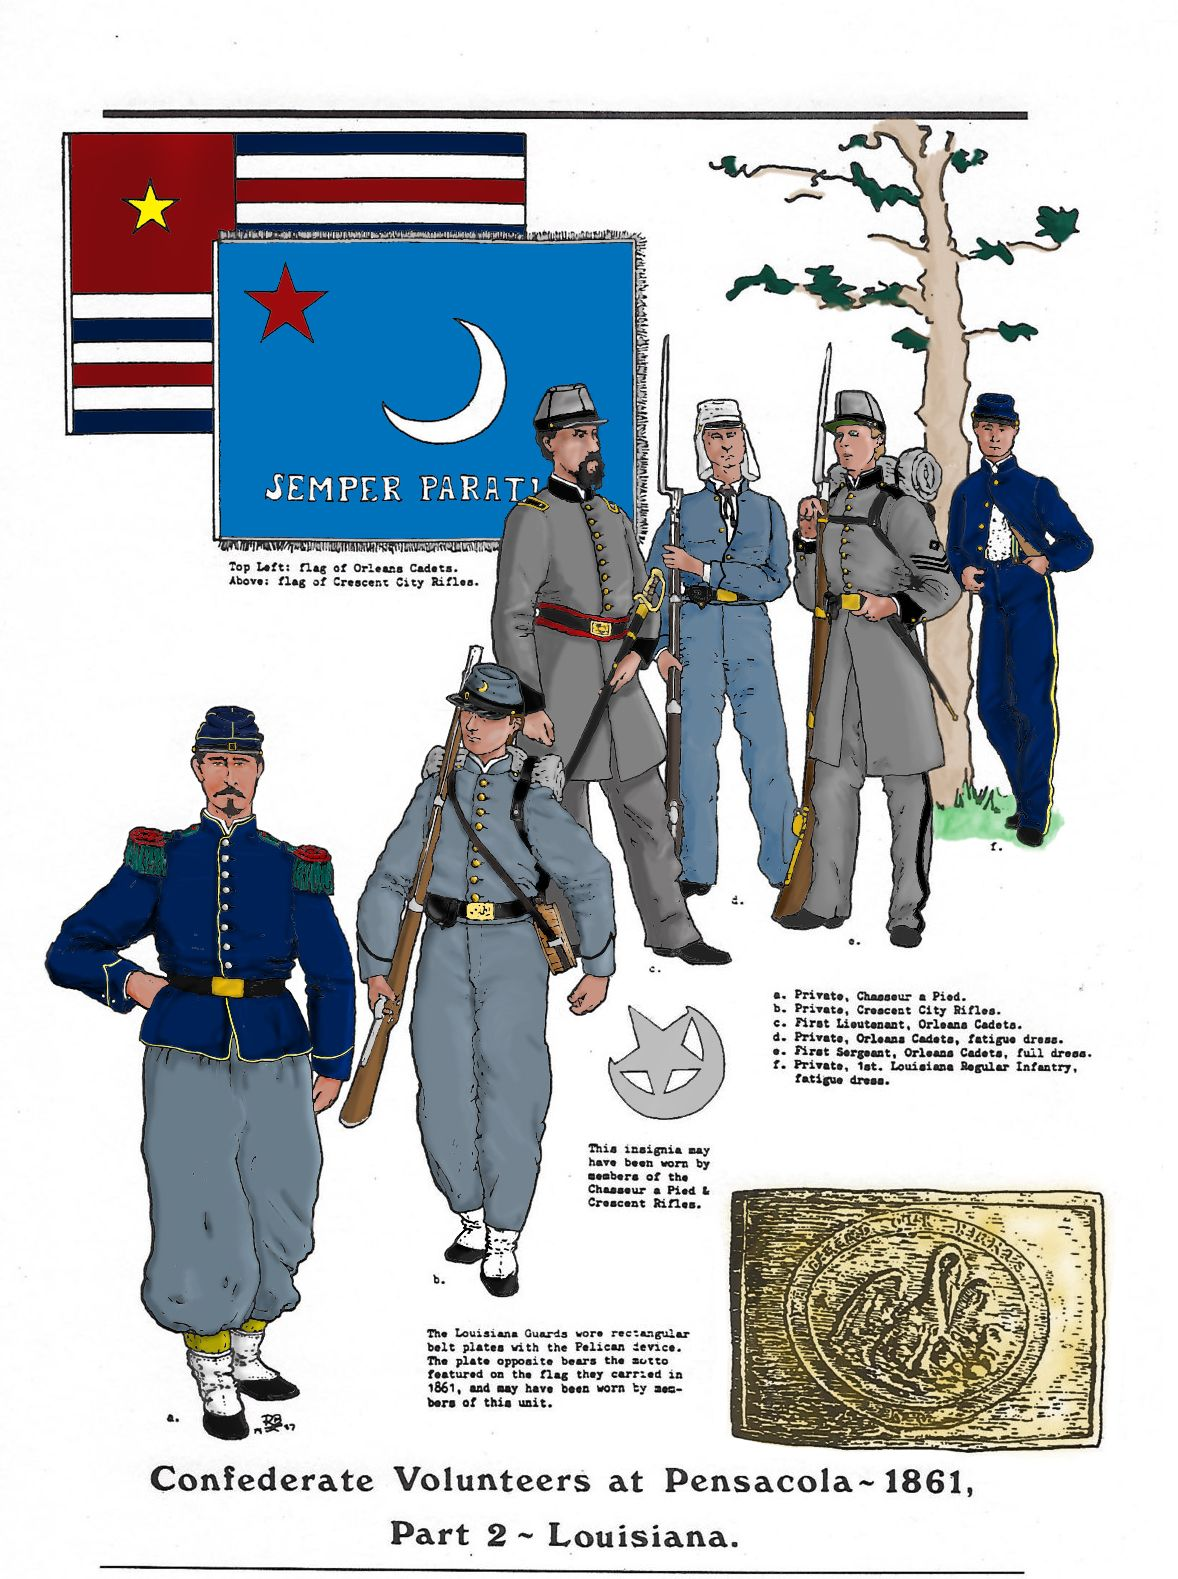 900 American Civil War Ideas In 2021 American Civil War Civil War War